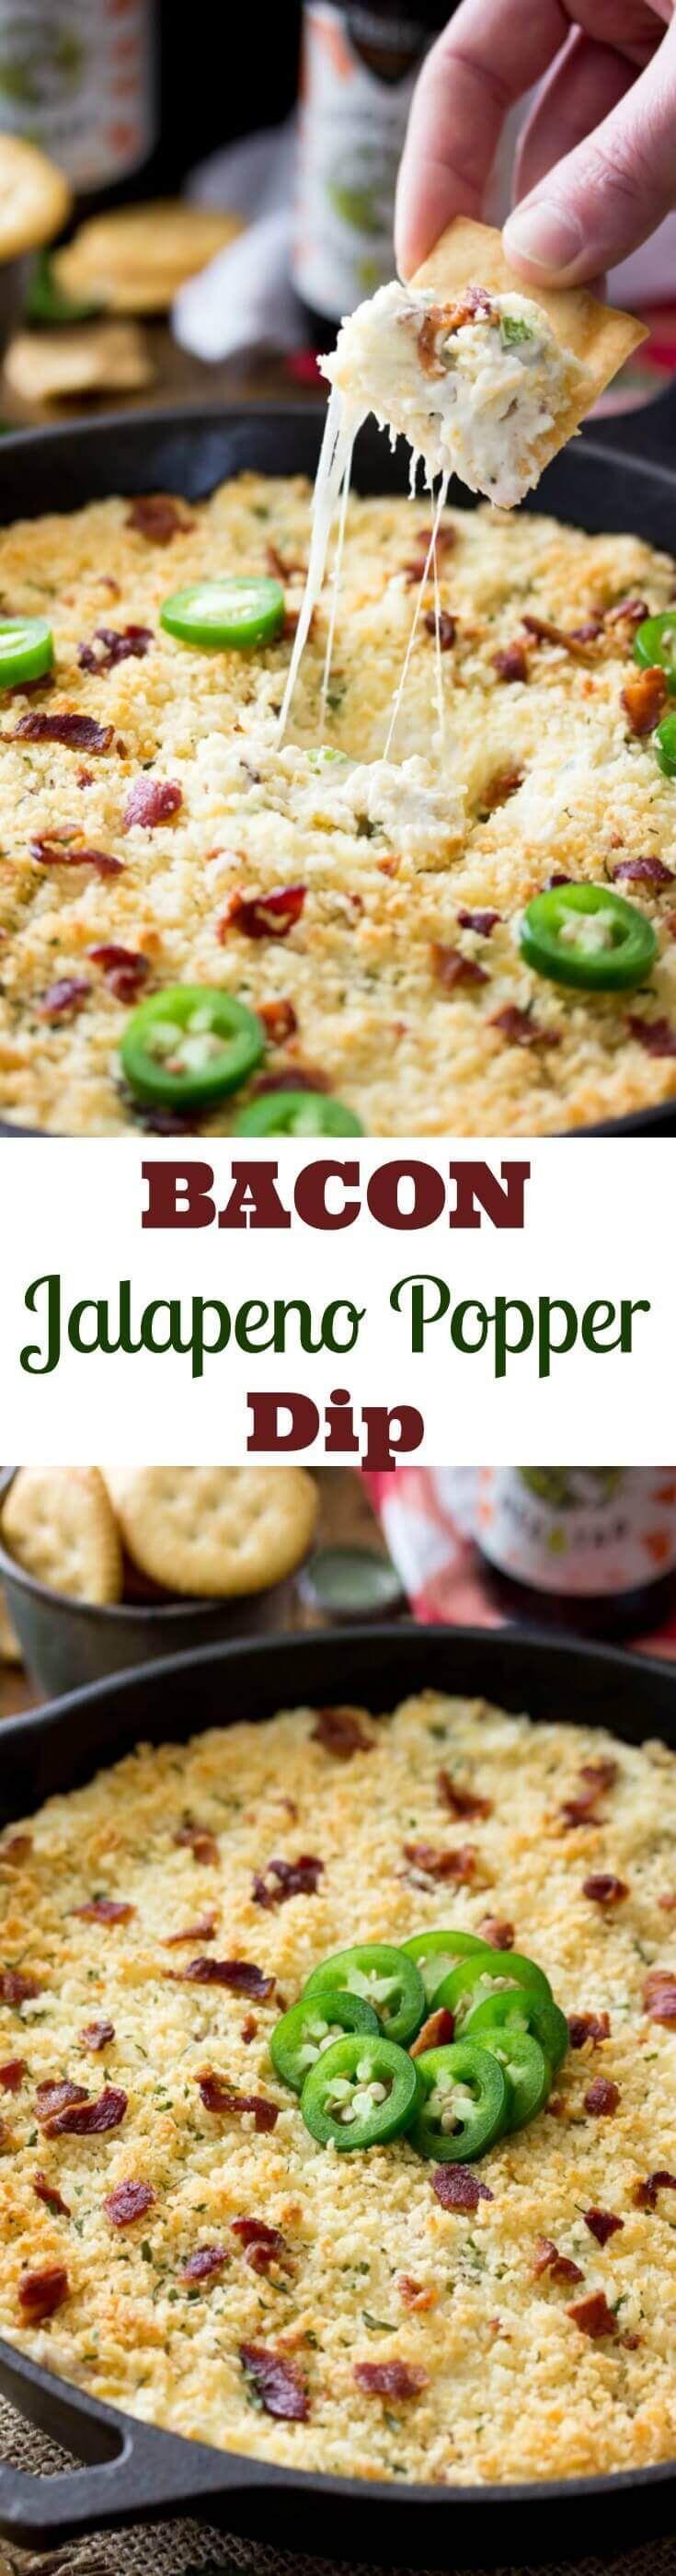 Bacon Jalapeno Popper Dip!  Your new favorite party dip.  || Sugar Spun Run via @sugarsunrun